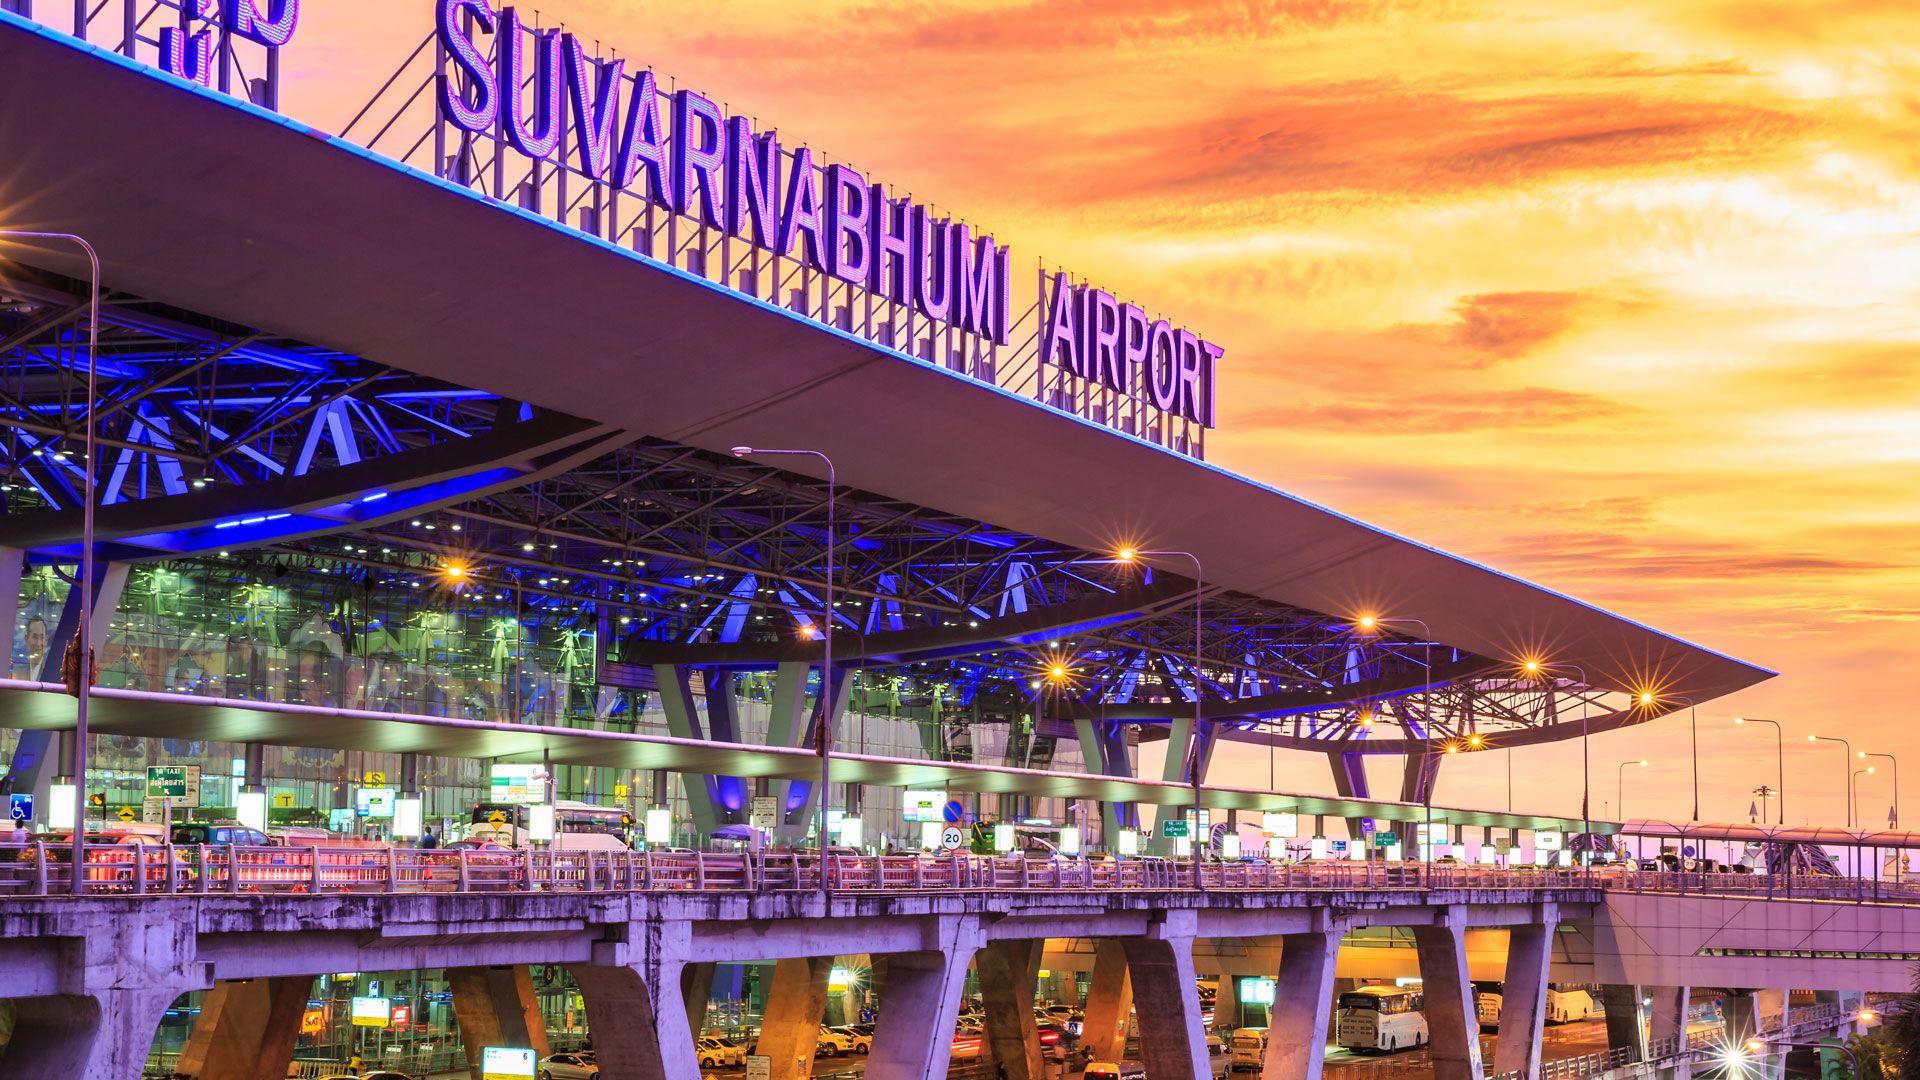 Louis vuitton bangkok airport